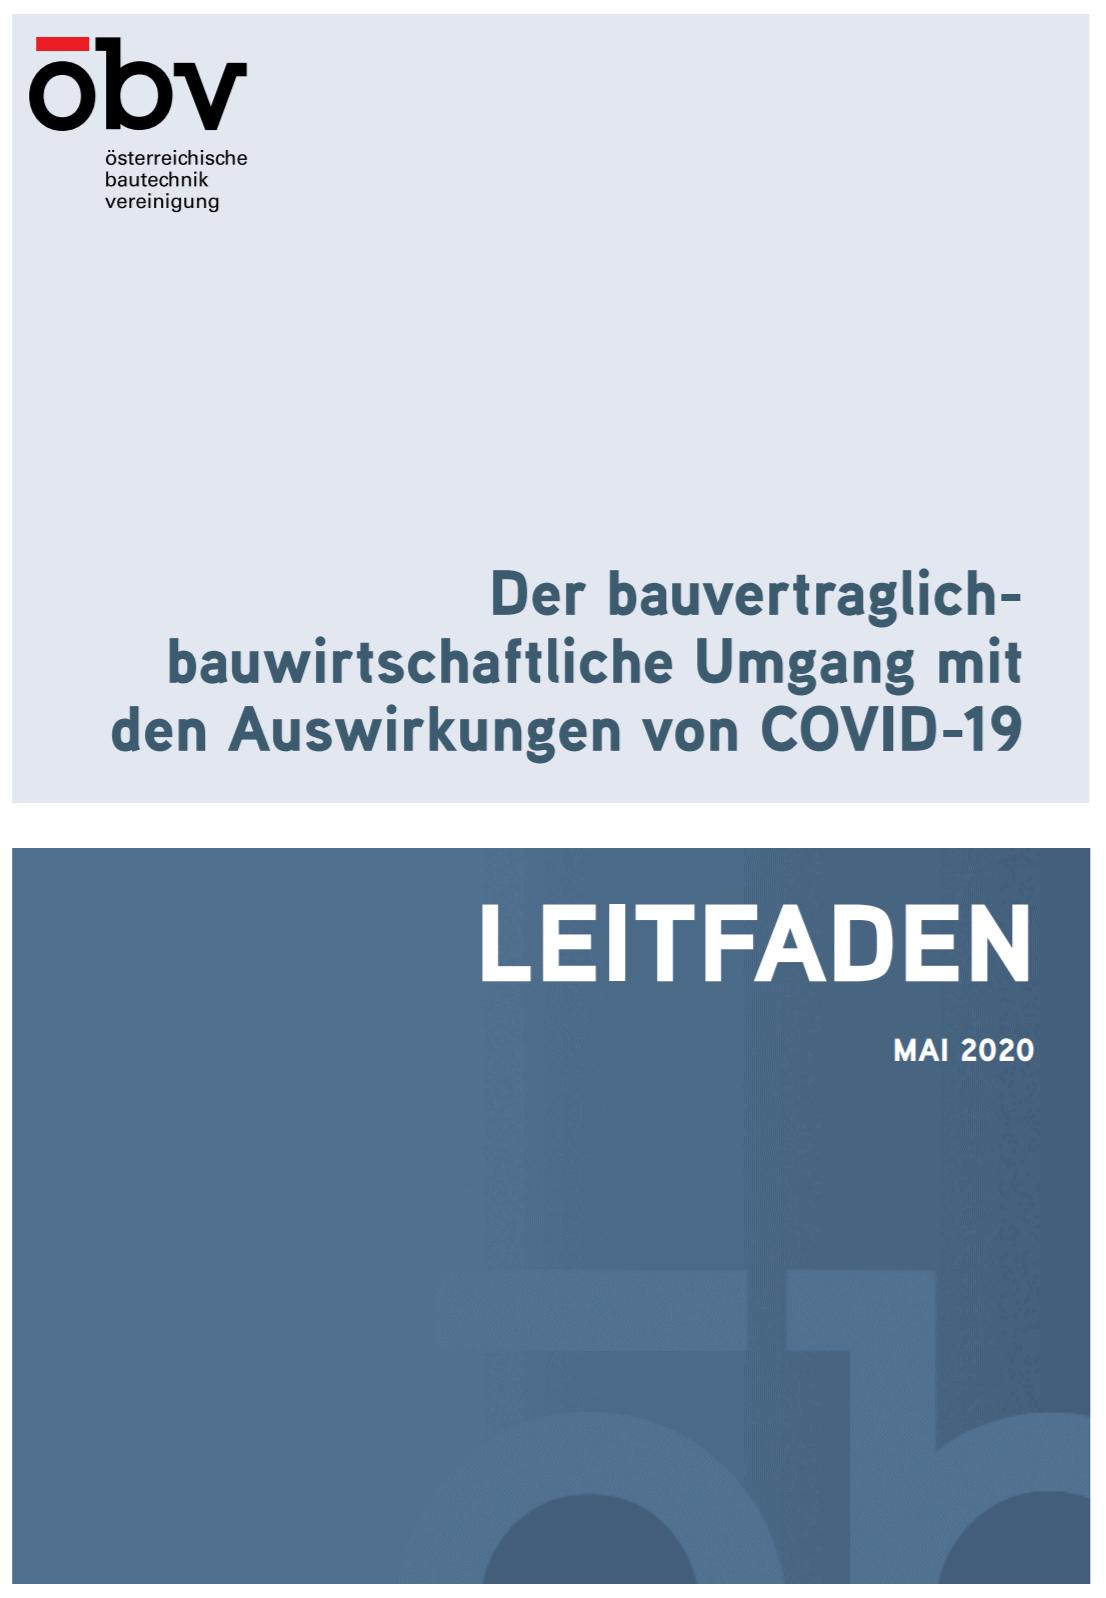 ÖBV-Leitfaden COVID-19